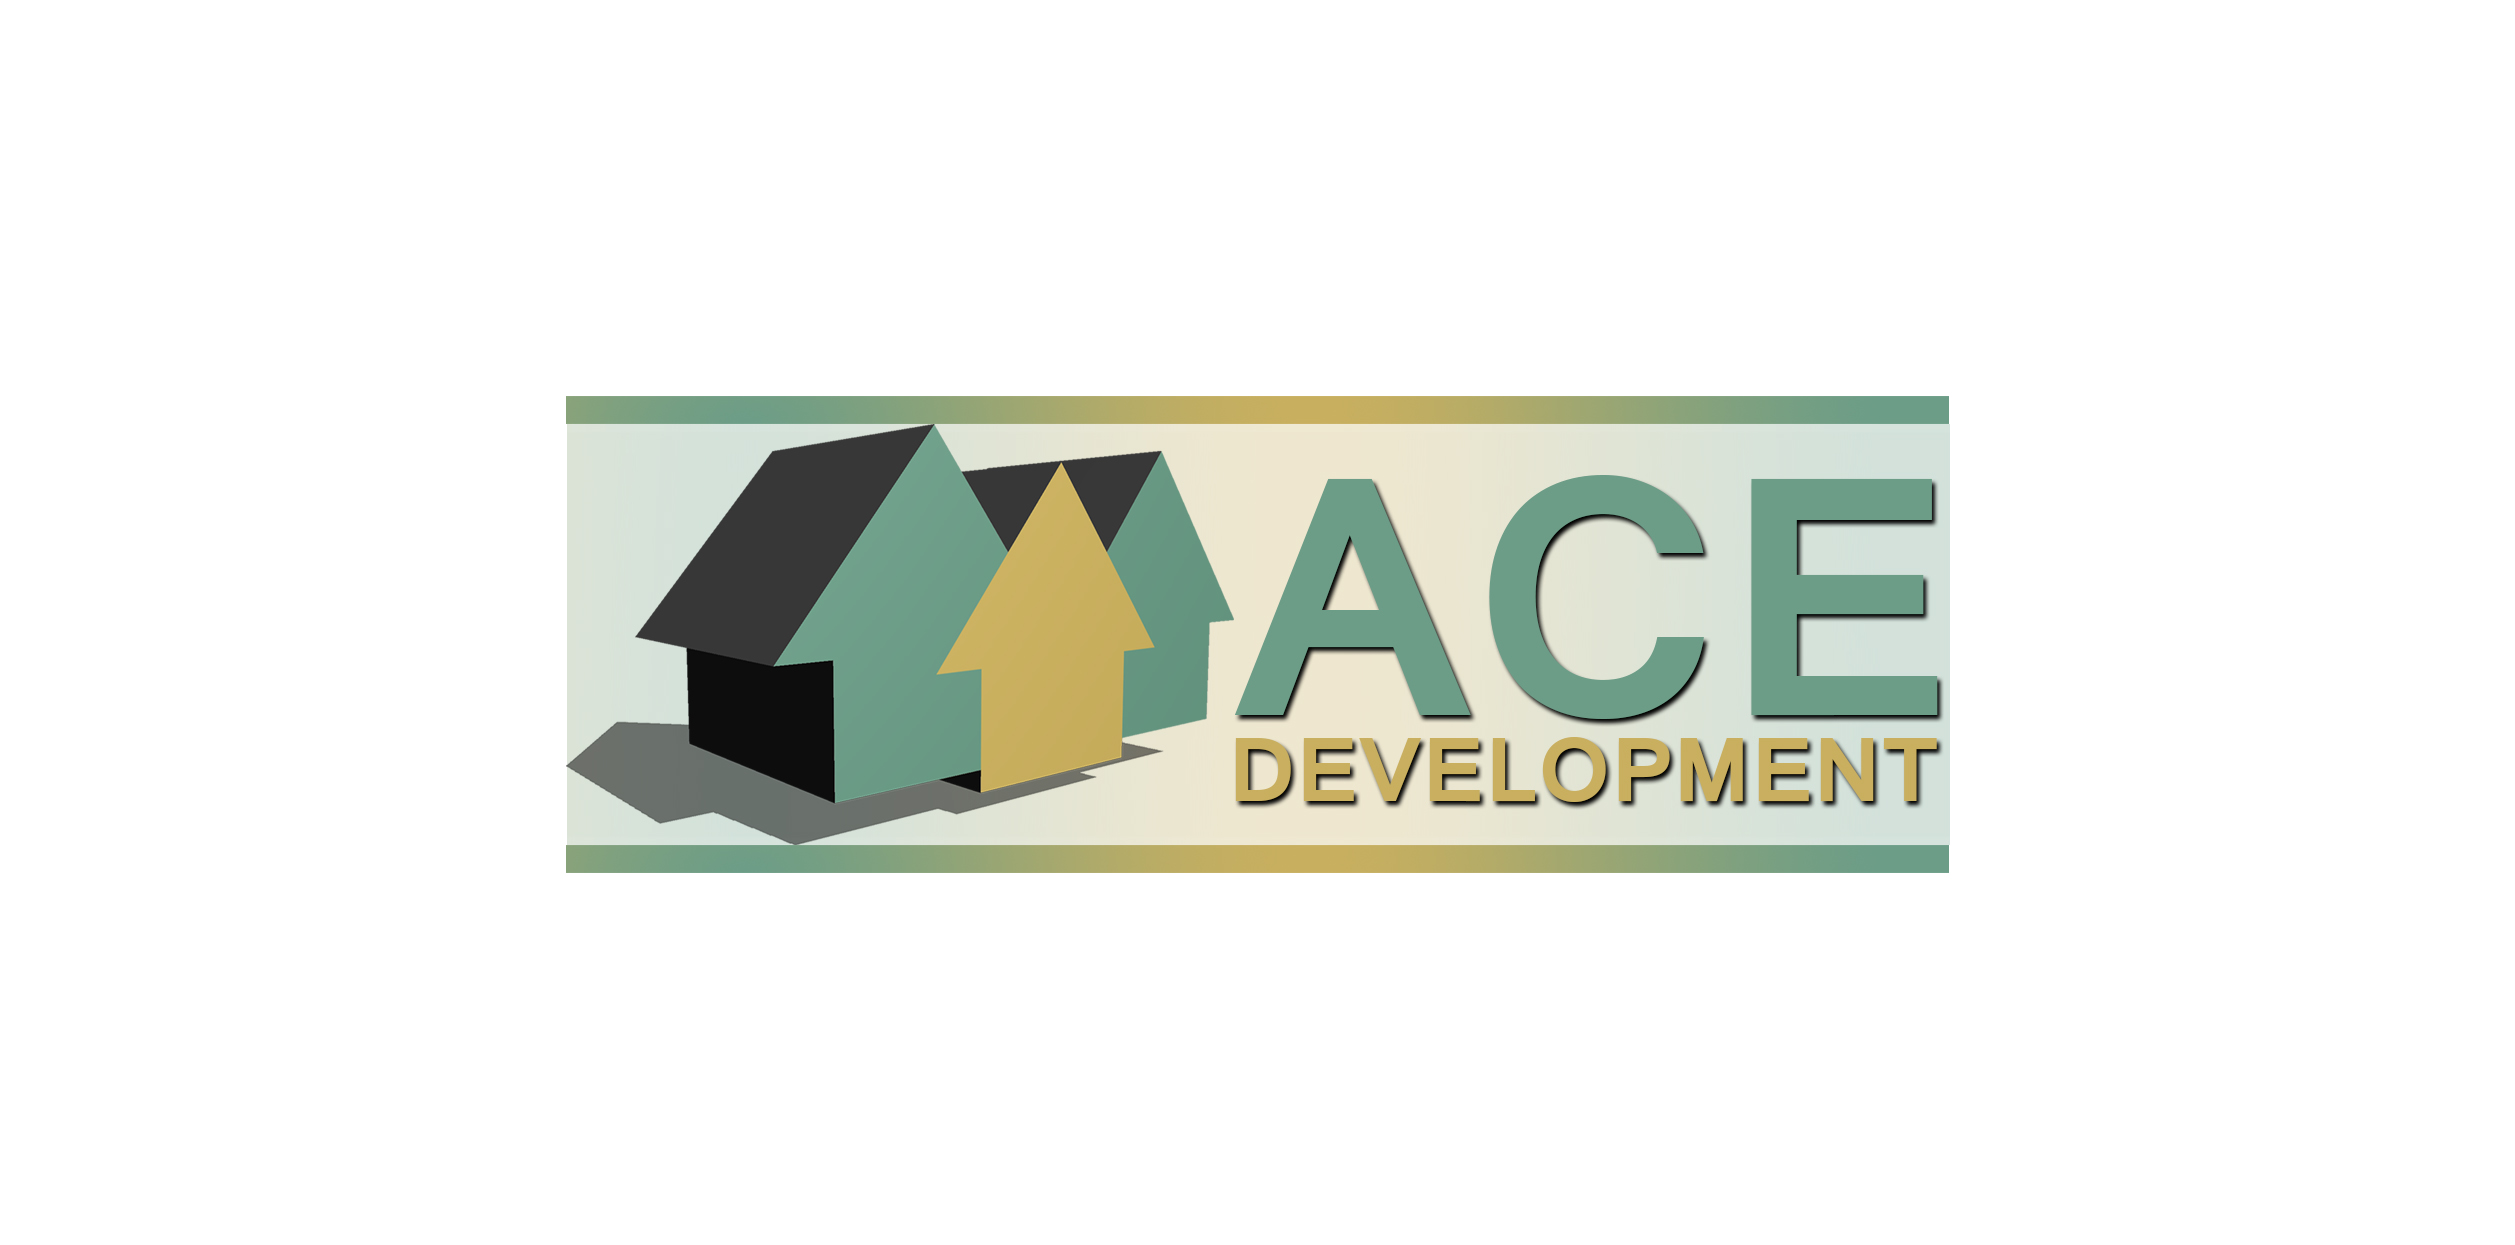 Logo Design by Bolkiah Verdadero - Entry No. 32 in the Logo Design Contest Fun Logo Design for Ace development.